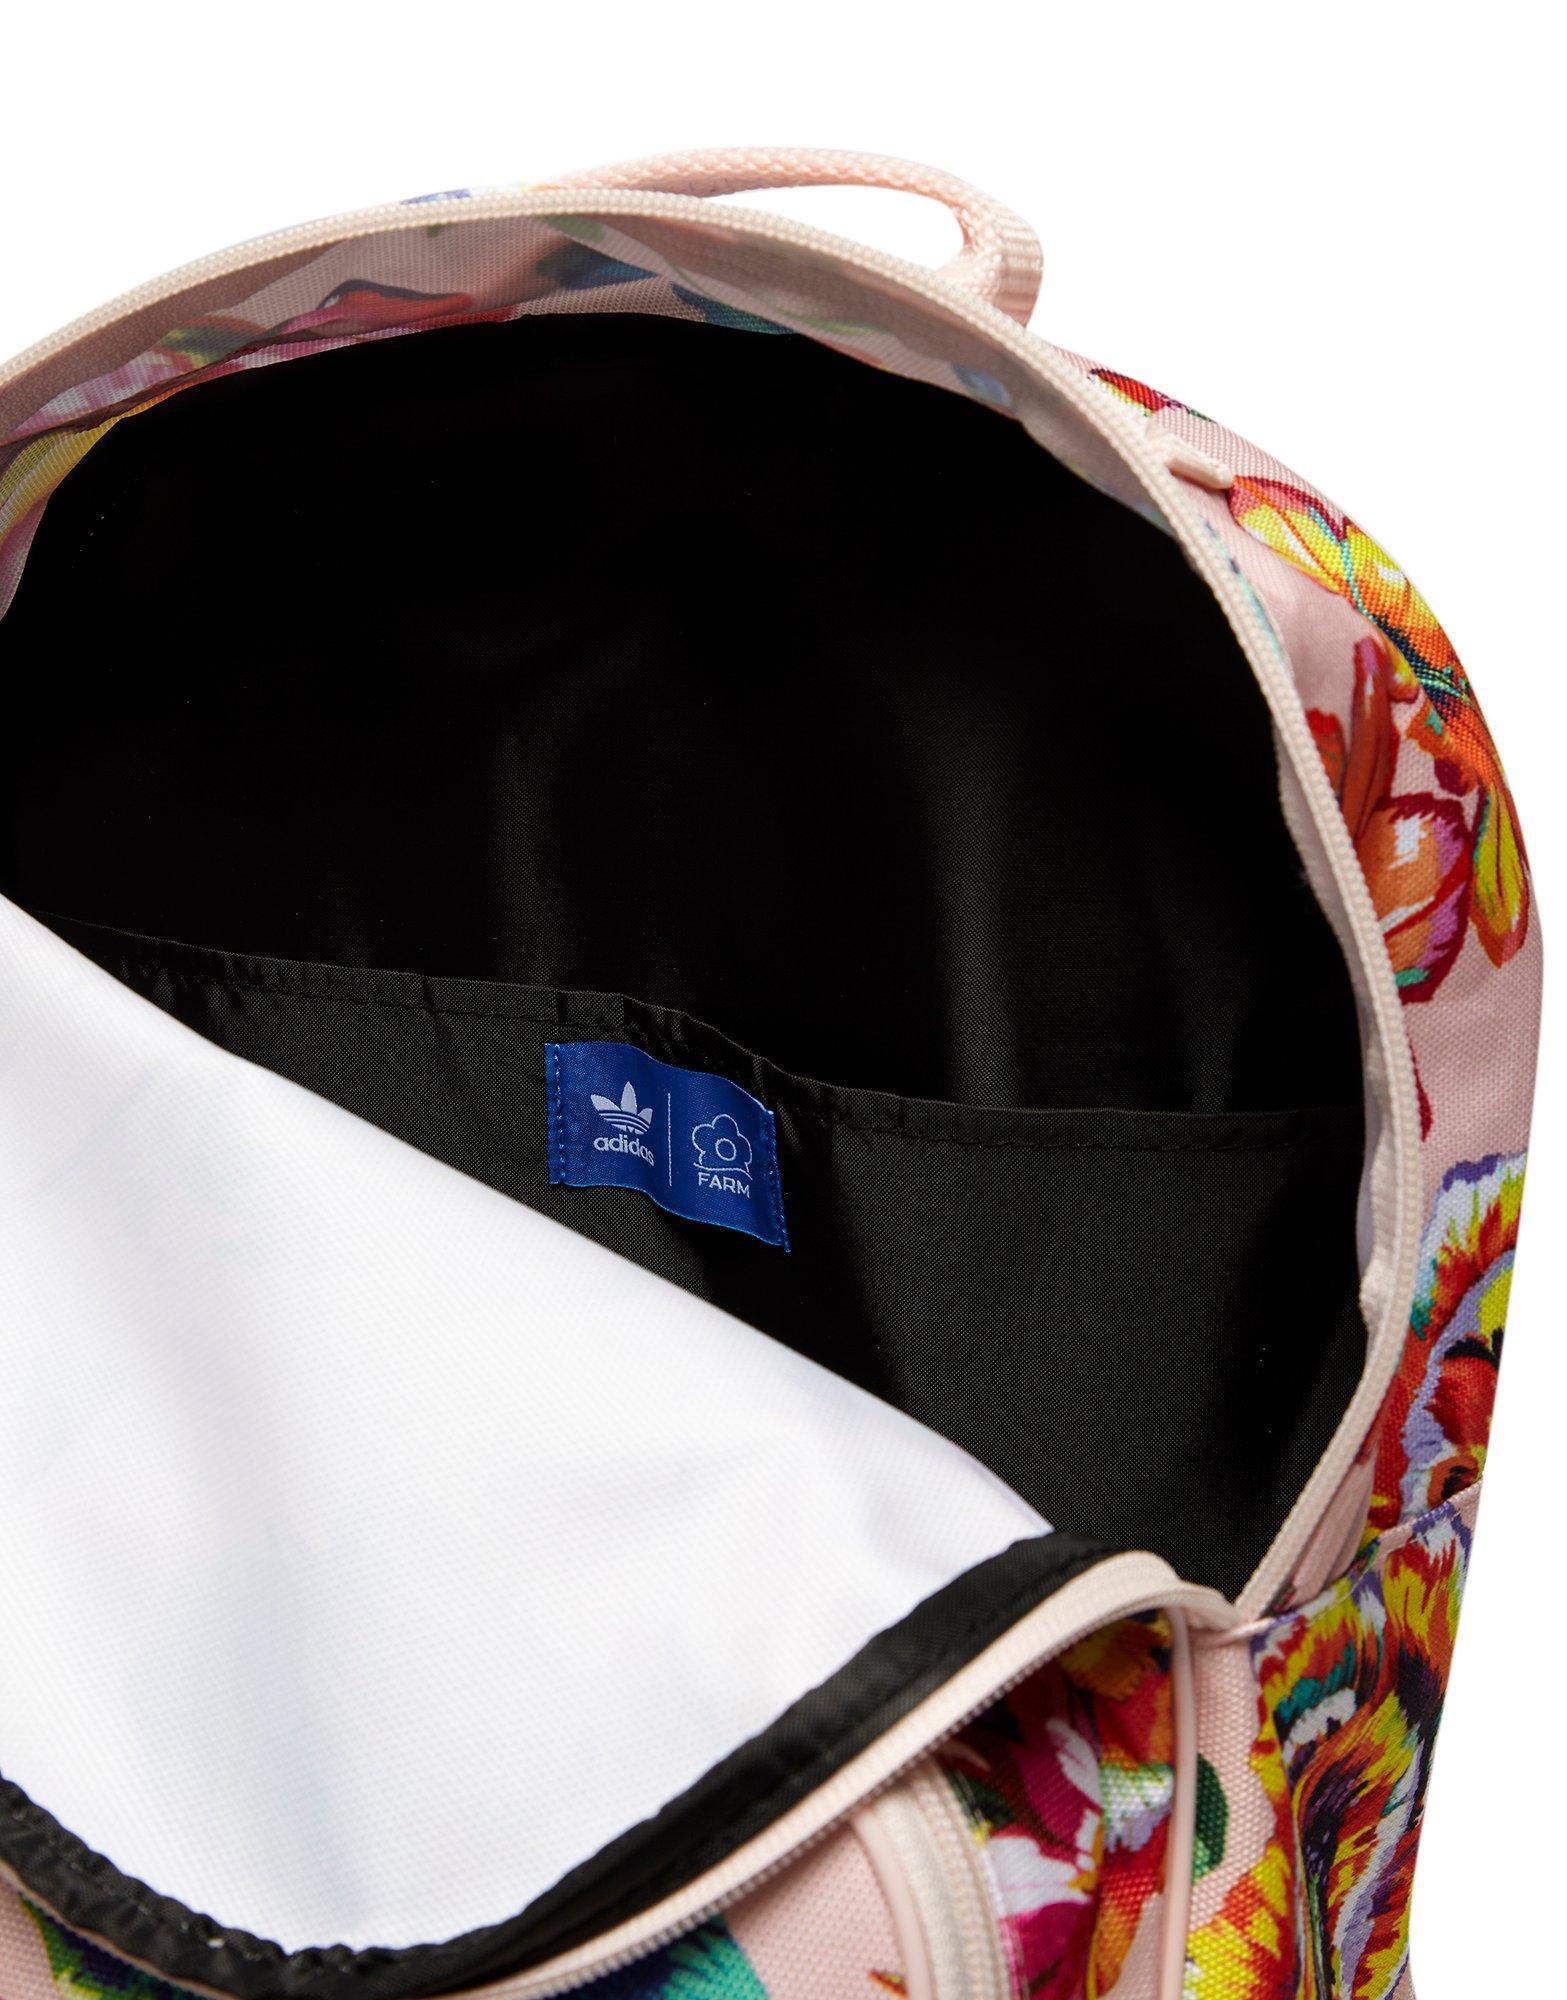 fa836c7f22 adidas Originals Farm Floralita Backpack in White - Lyst